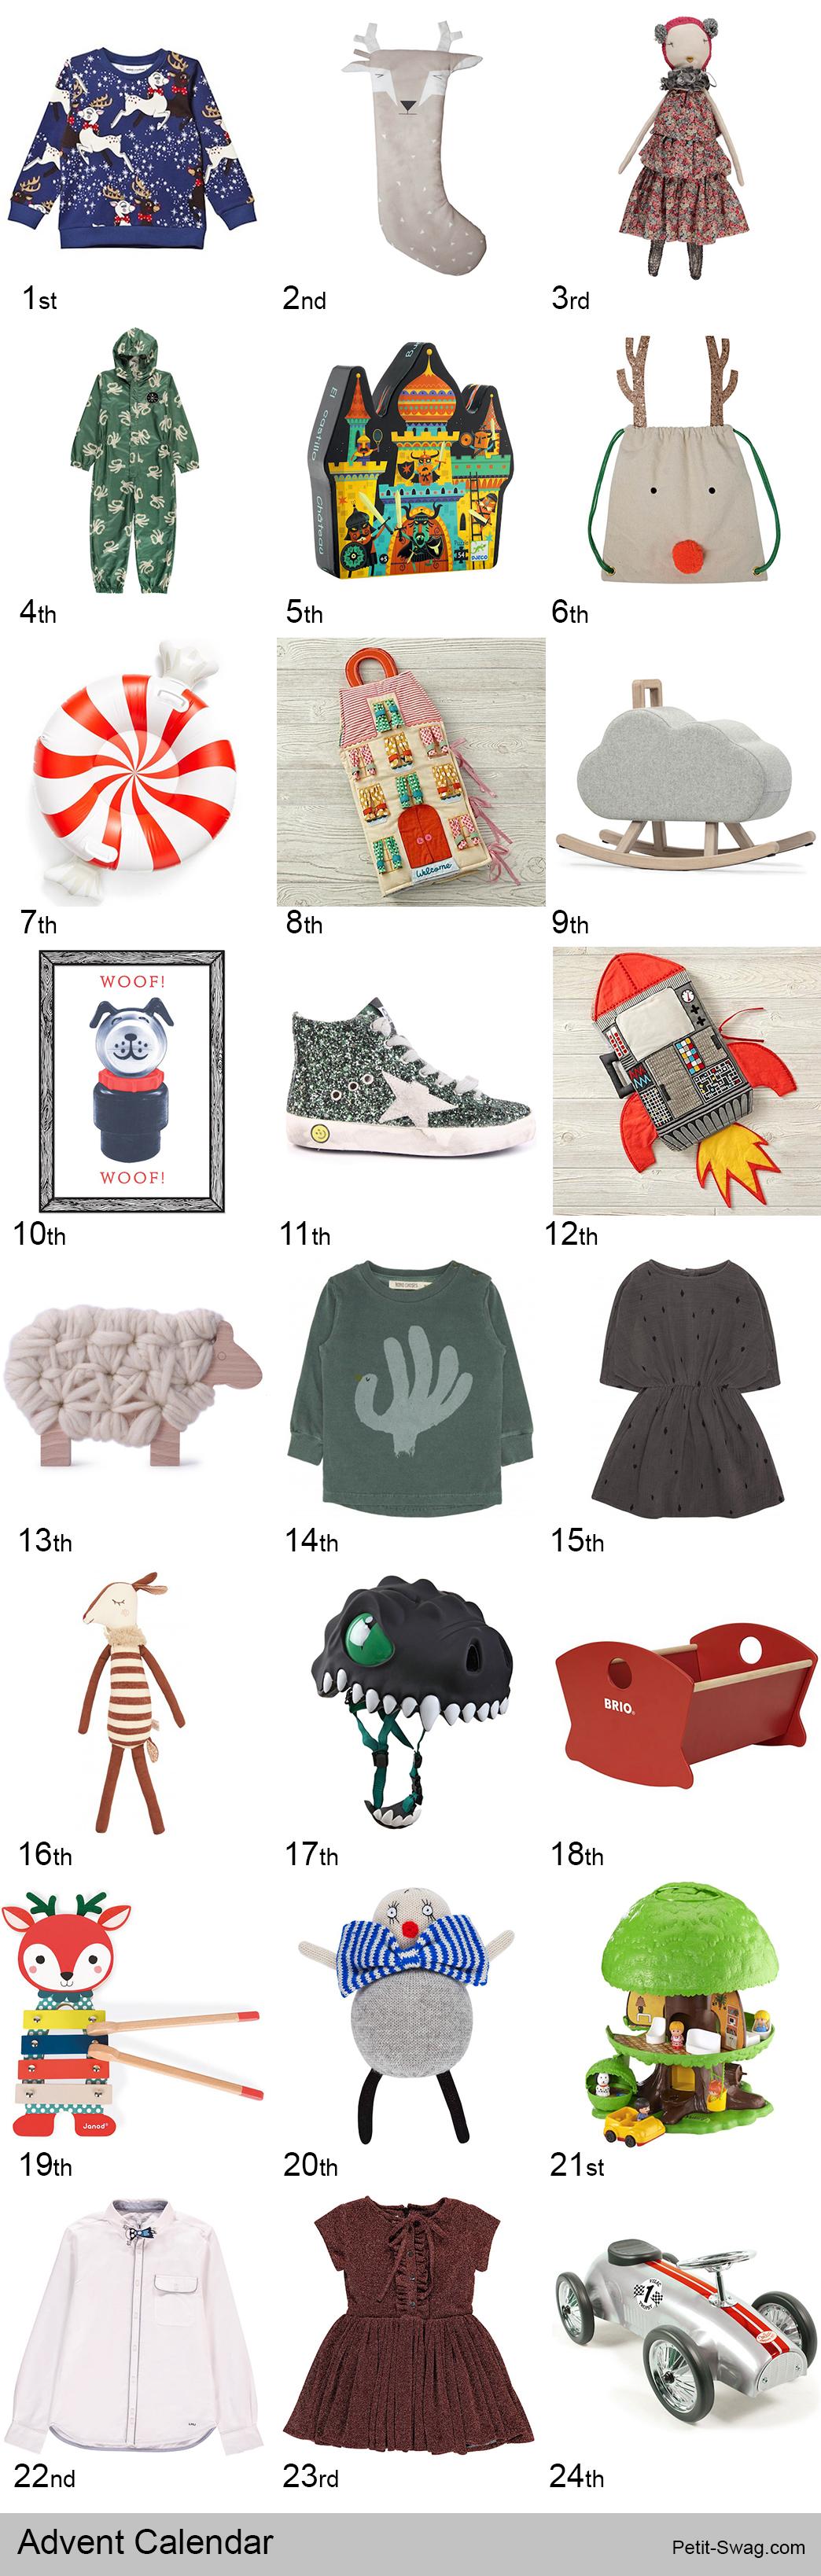 Advent Calendar | Petit-Swag